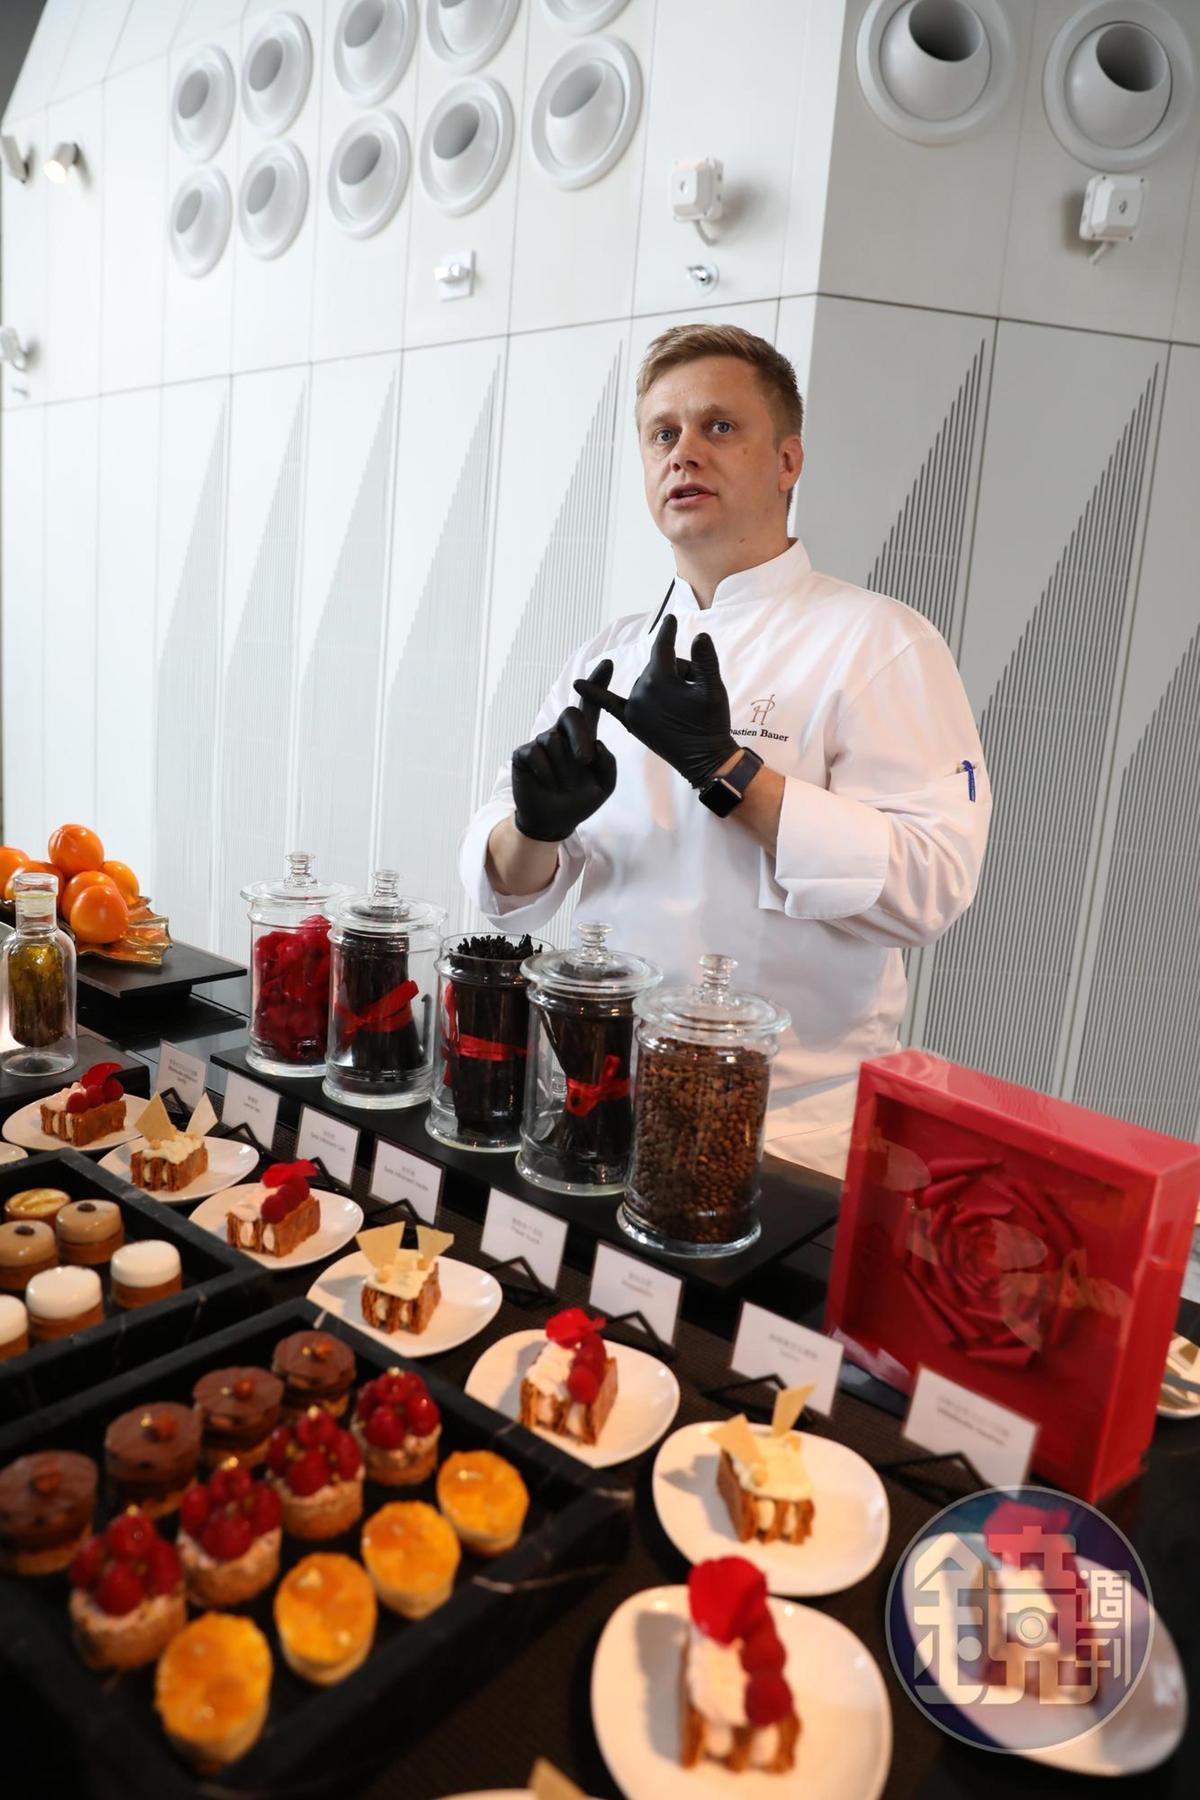 Sébastien很願意與食客分享自己創作甜點的想法與過程。